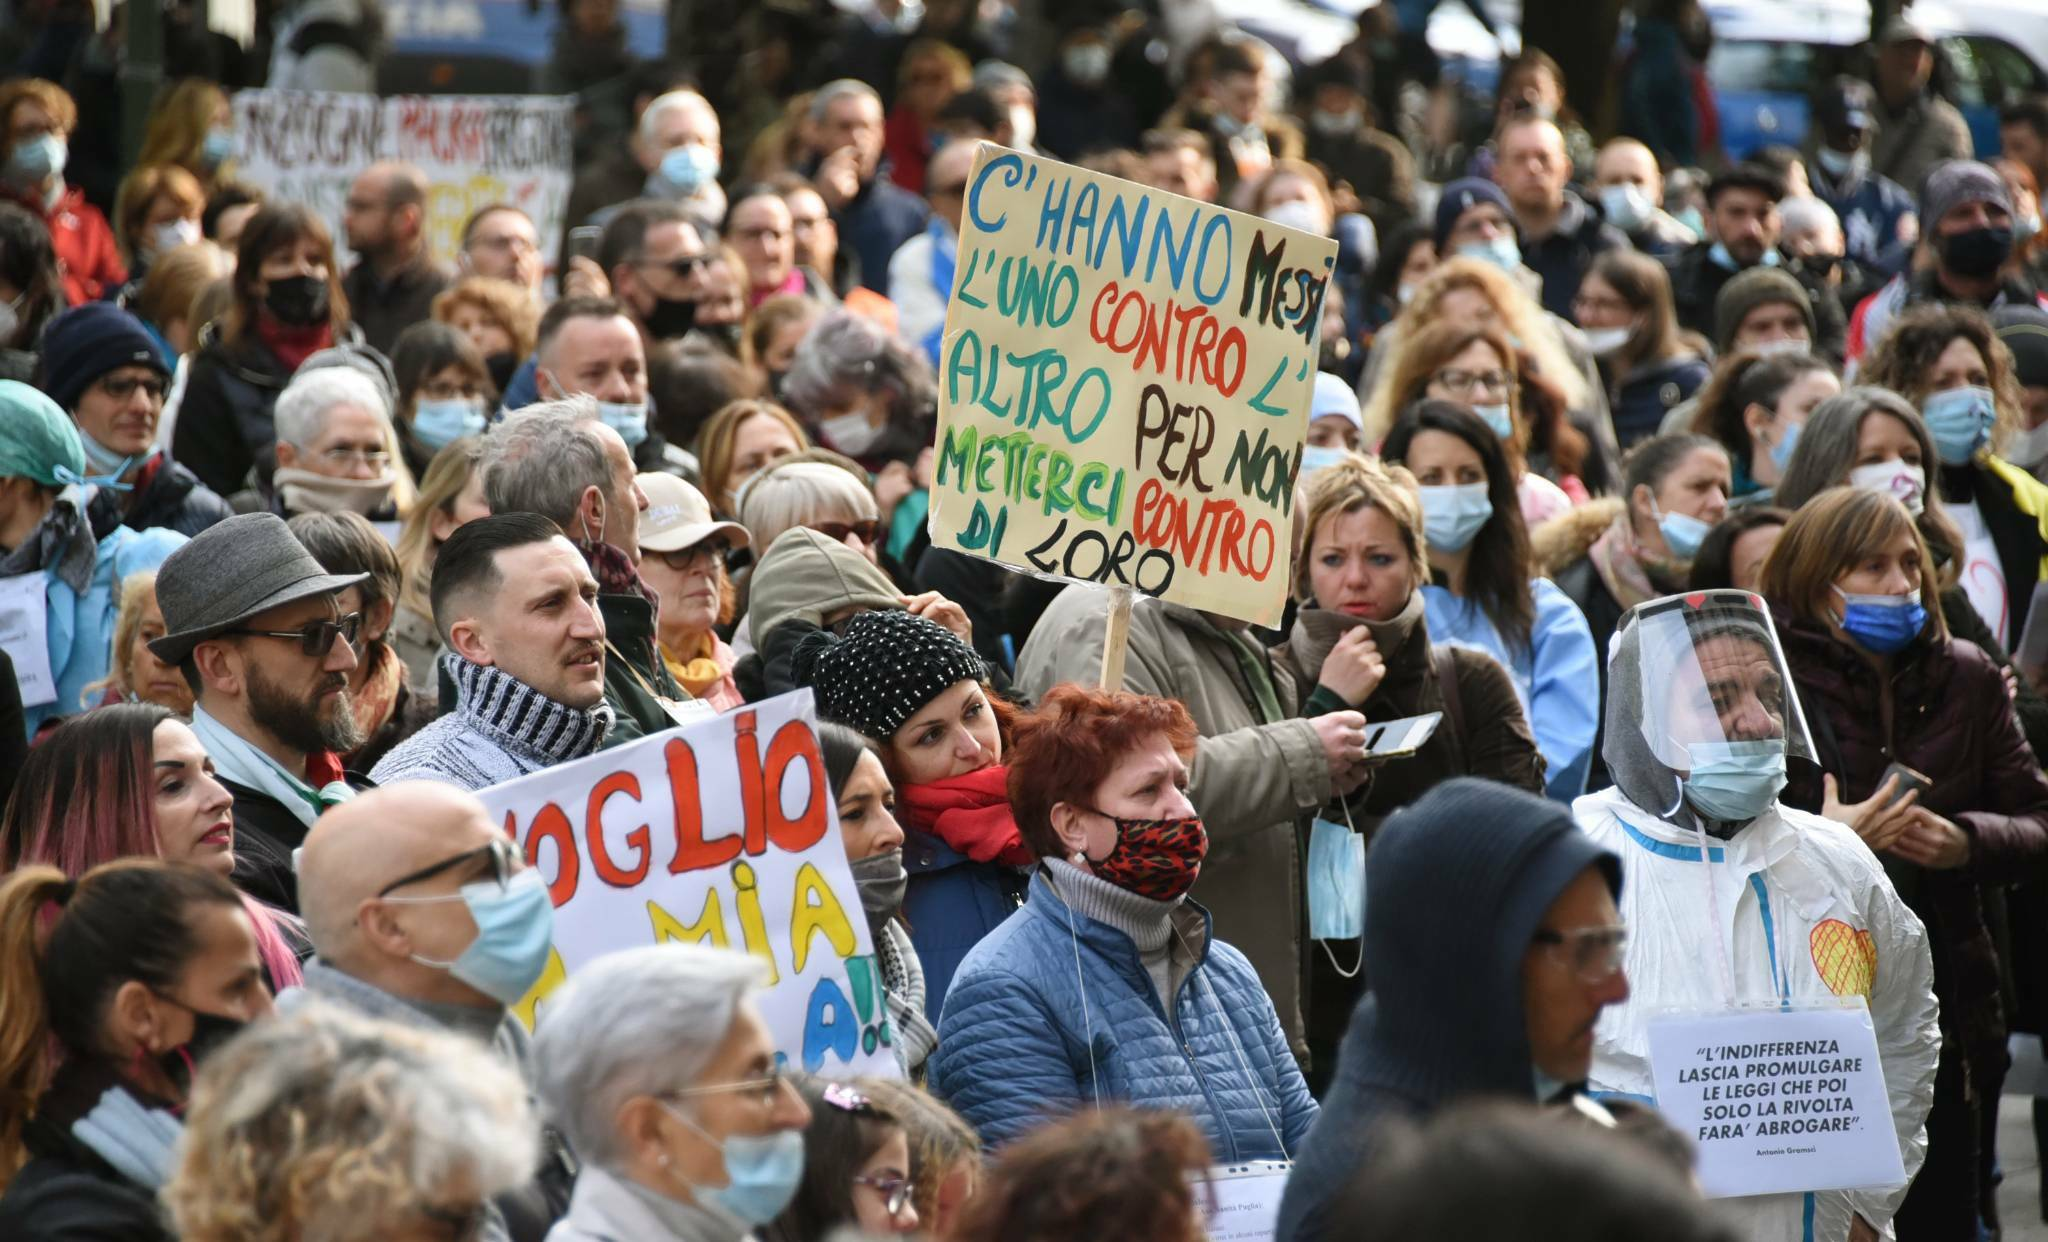 No paura day a Bergamo